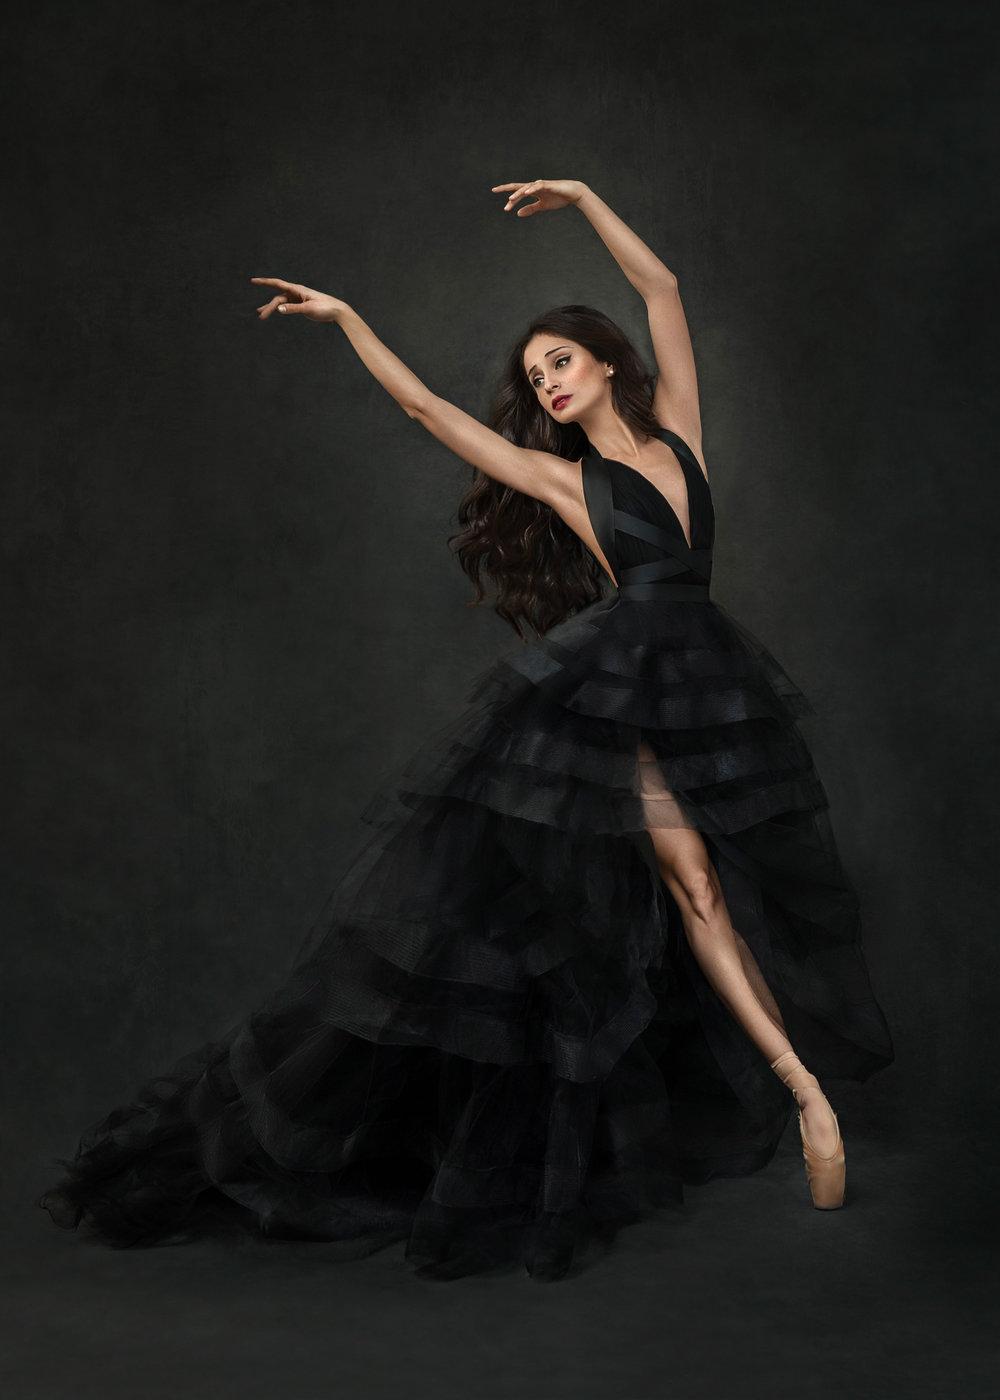 ind-spanishdancer-25-35_2048px.jpg